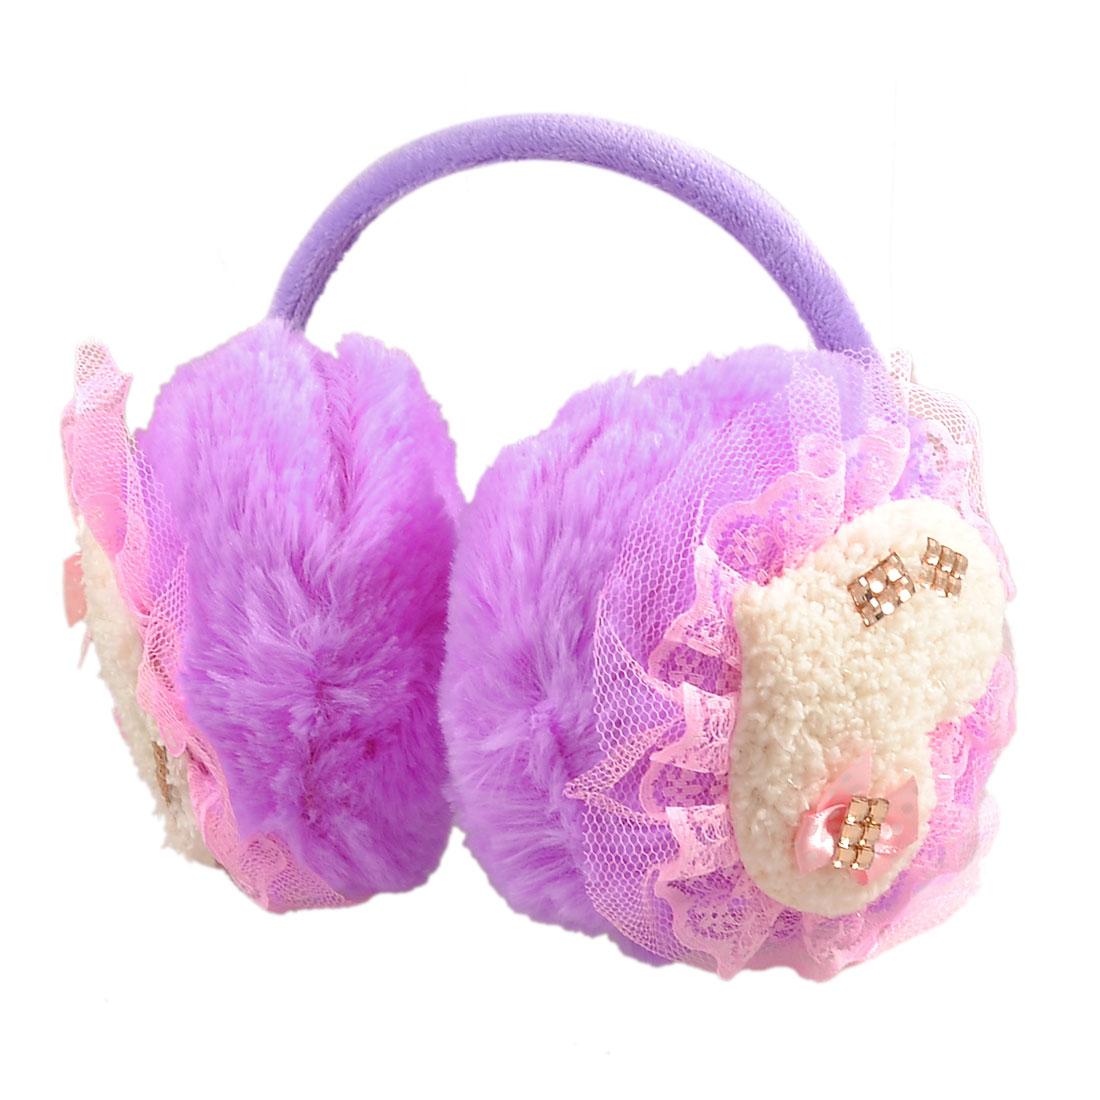 Glittery Crystal Heart Detail Plush Fluffy Ear Cover Back Earmuffs Purple